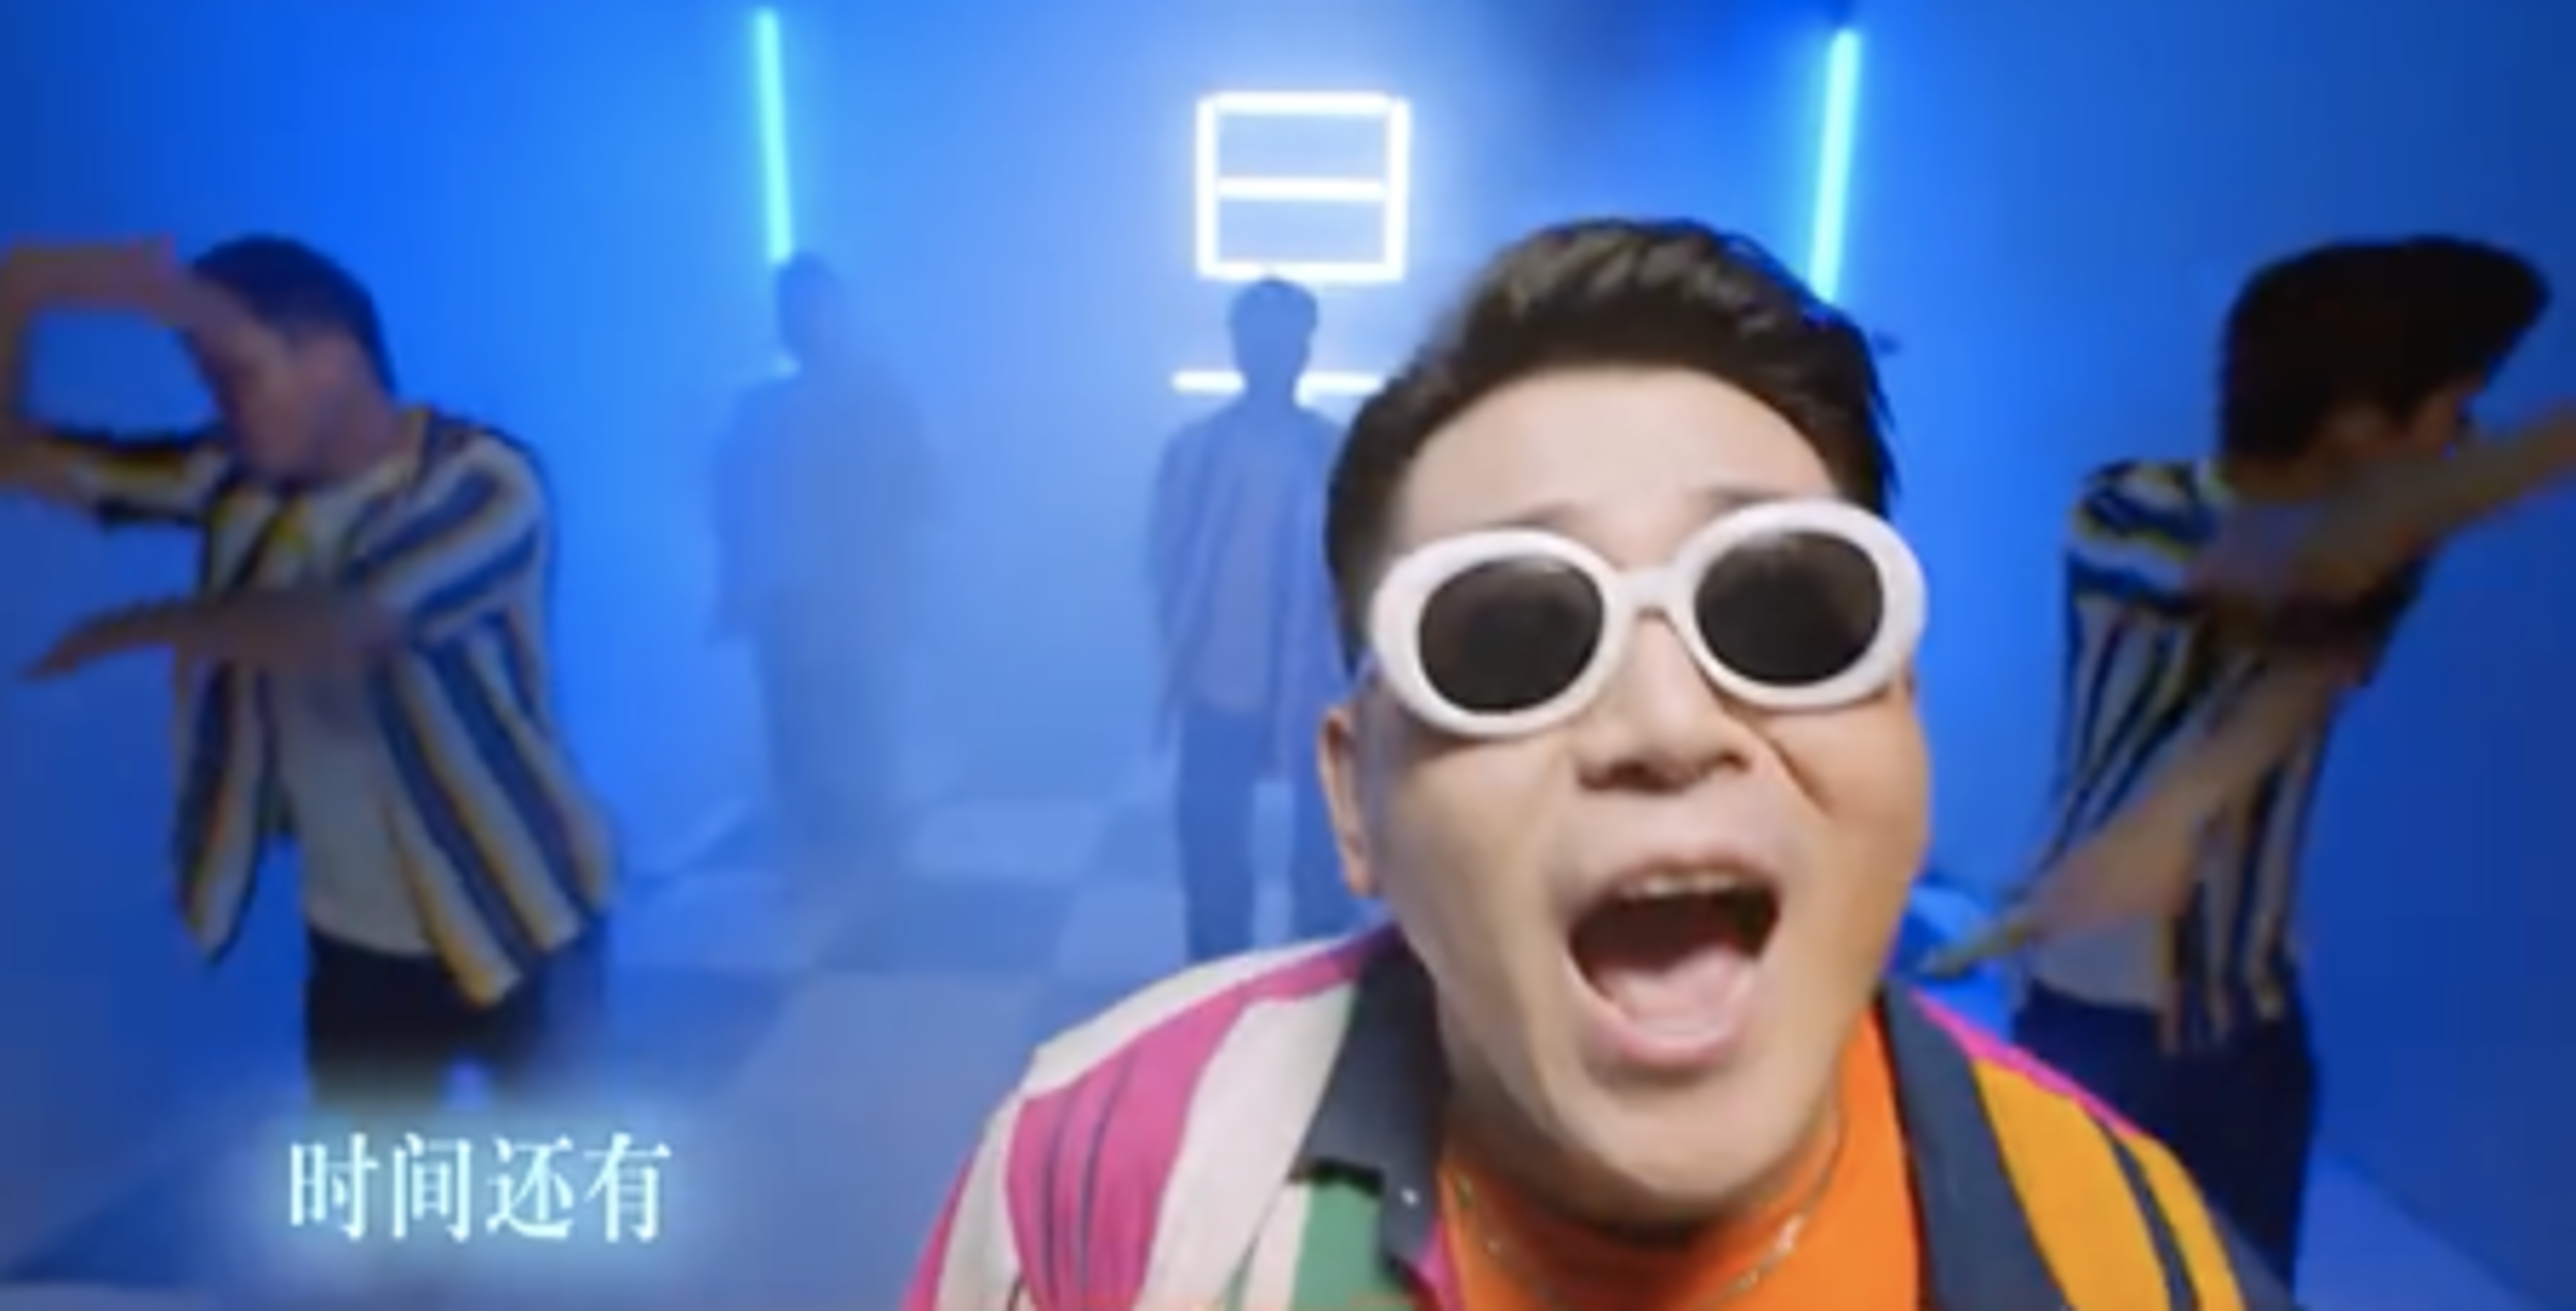 A singing skit on Saturday Night Live China.